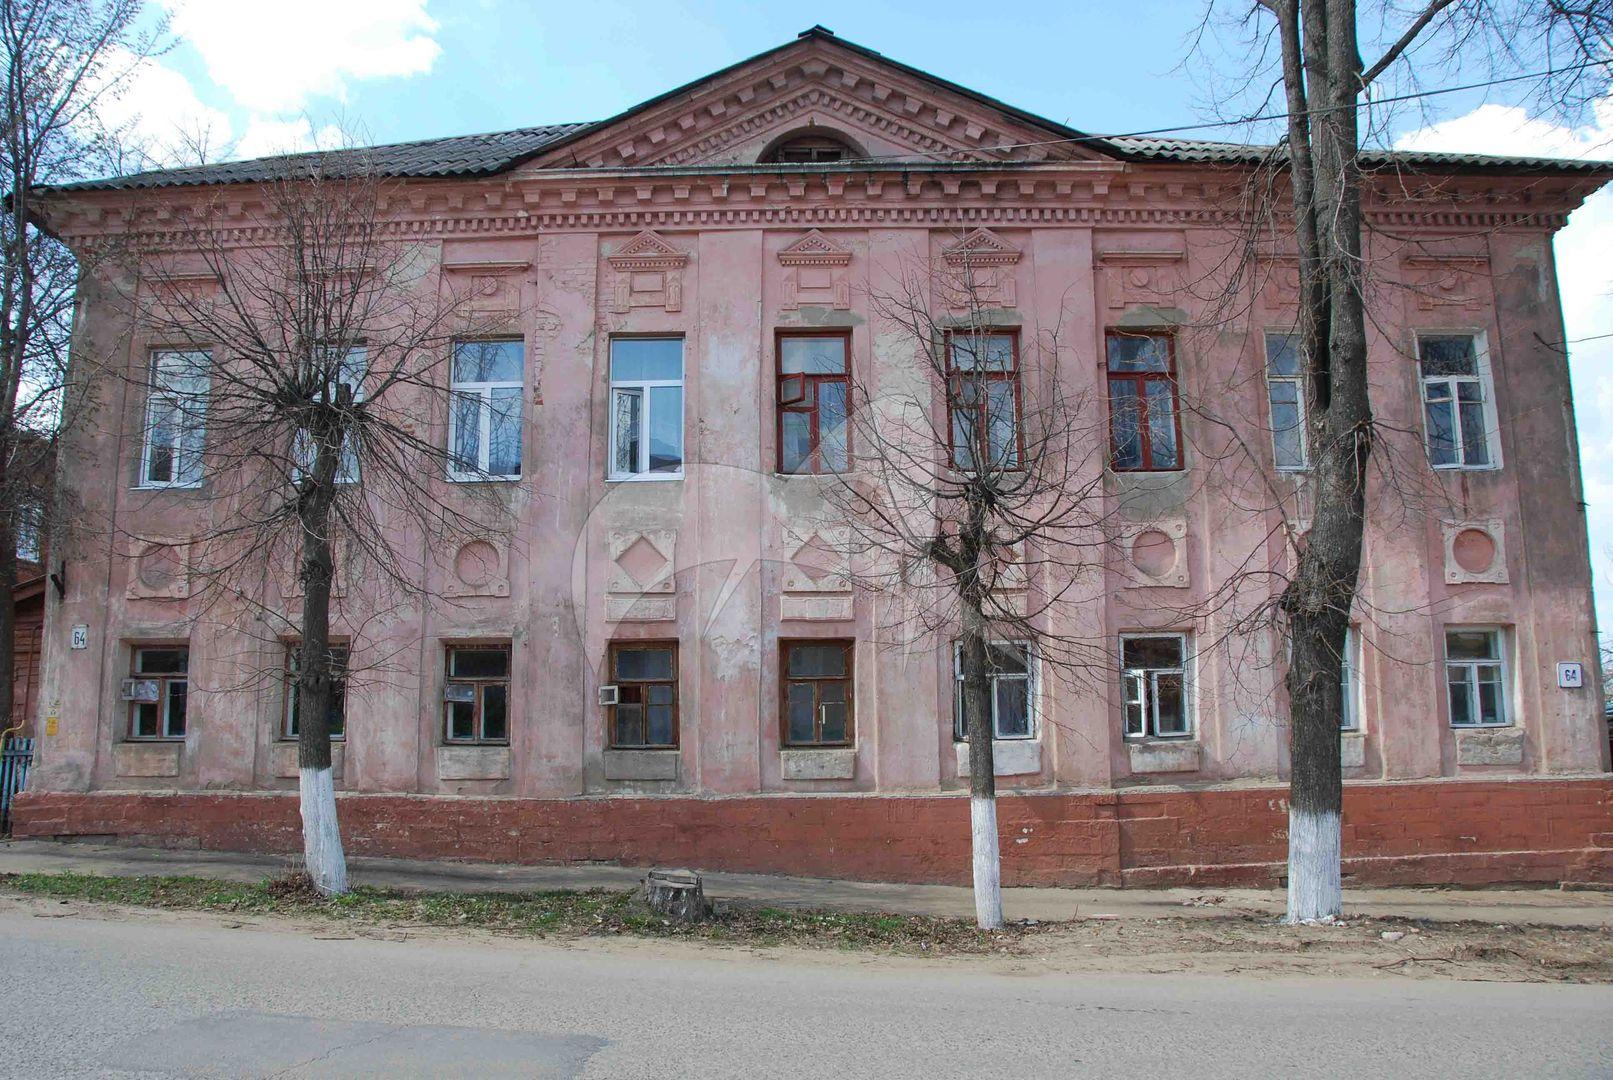 Дом жилой, конец XVIII-XIX вв.